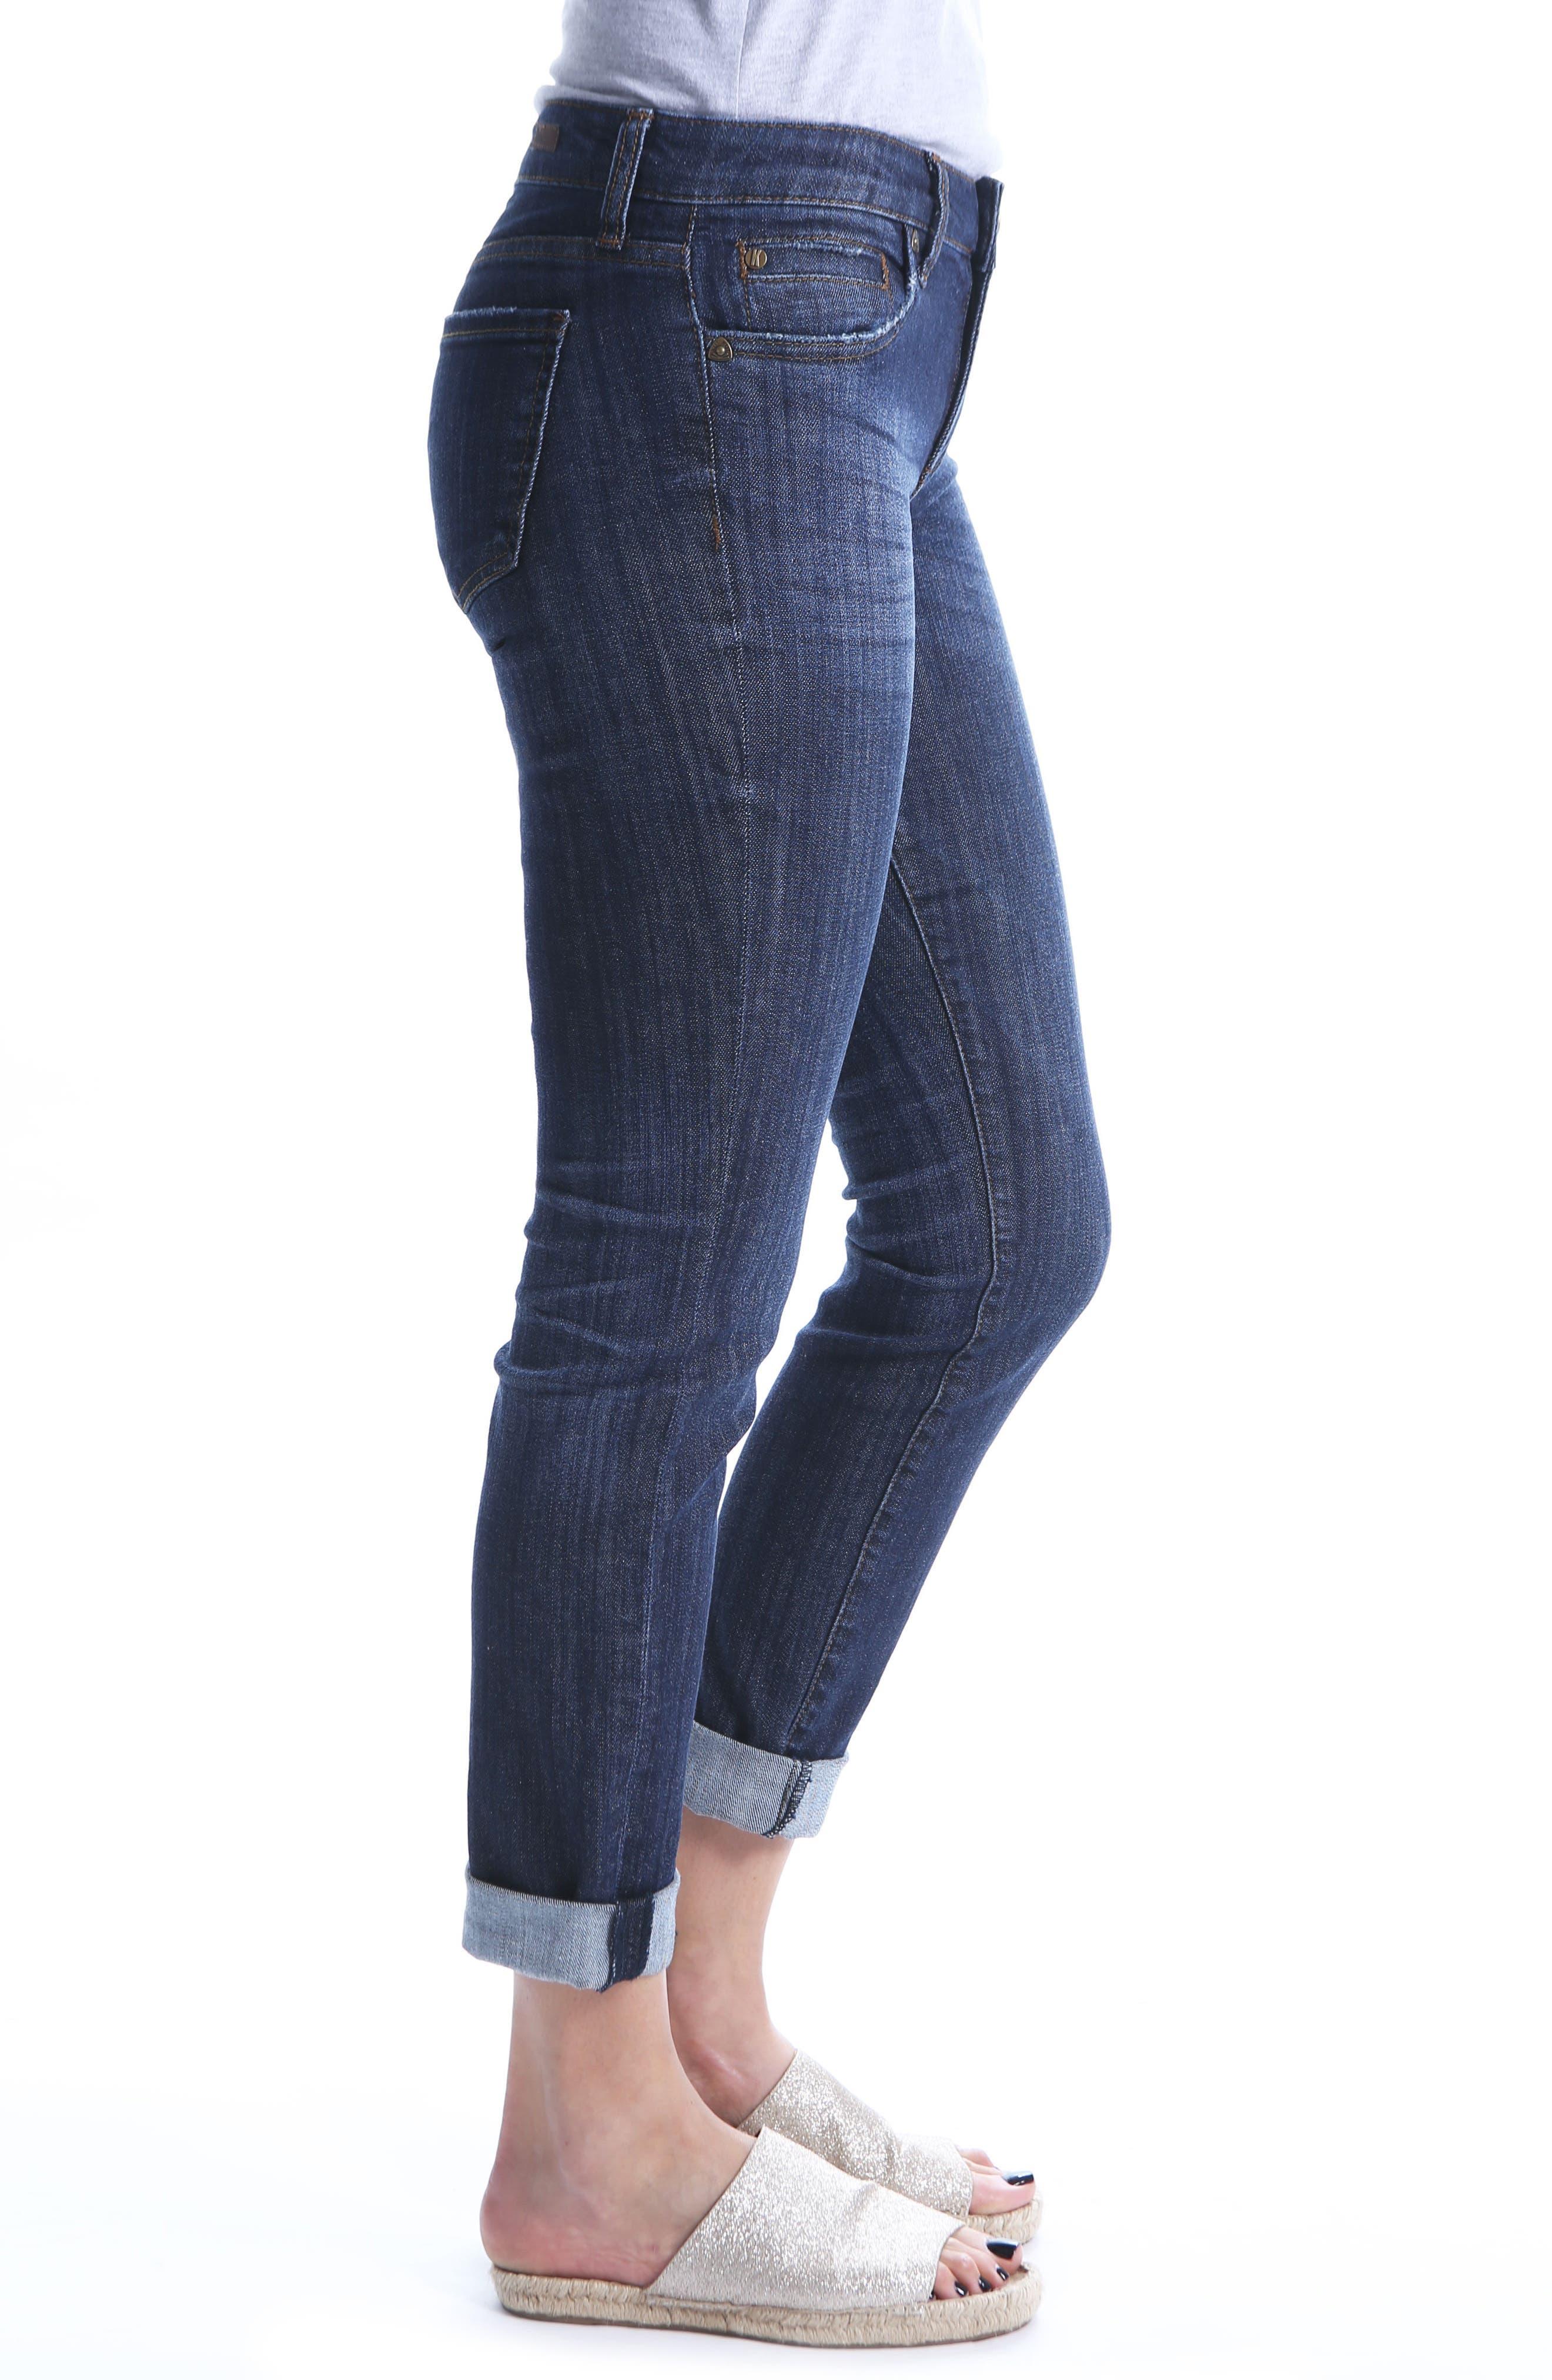 Alternate Image 3  - KUT from the Kloth Catherine Boyfriend Jeans (Regular & Petite) (Enticement)